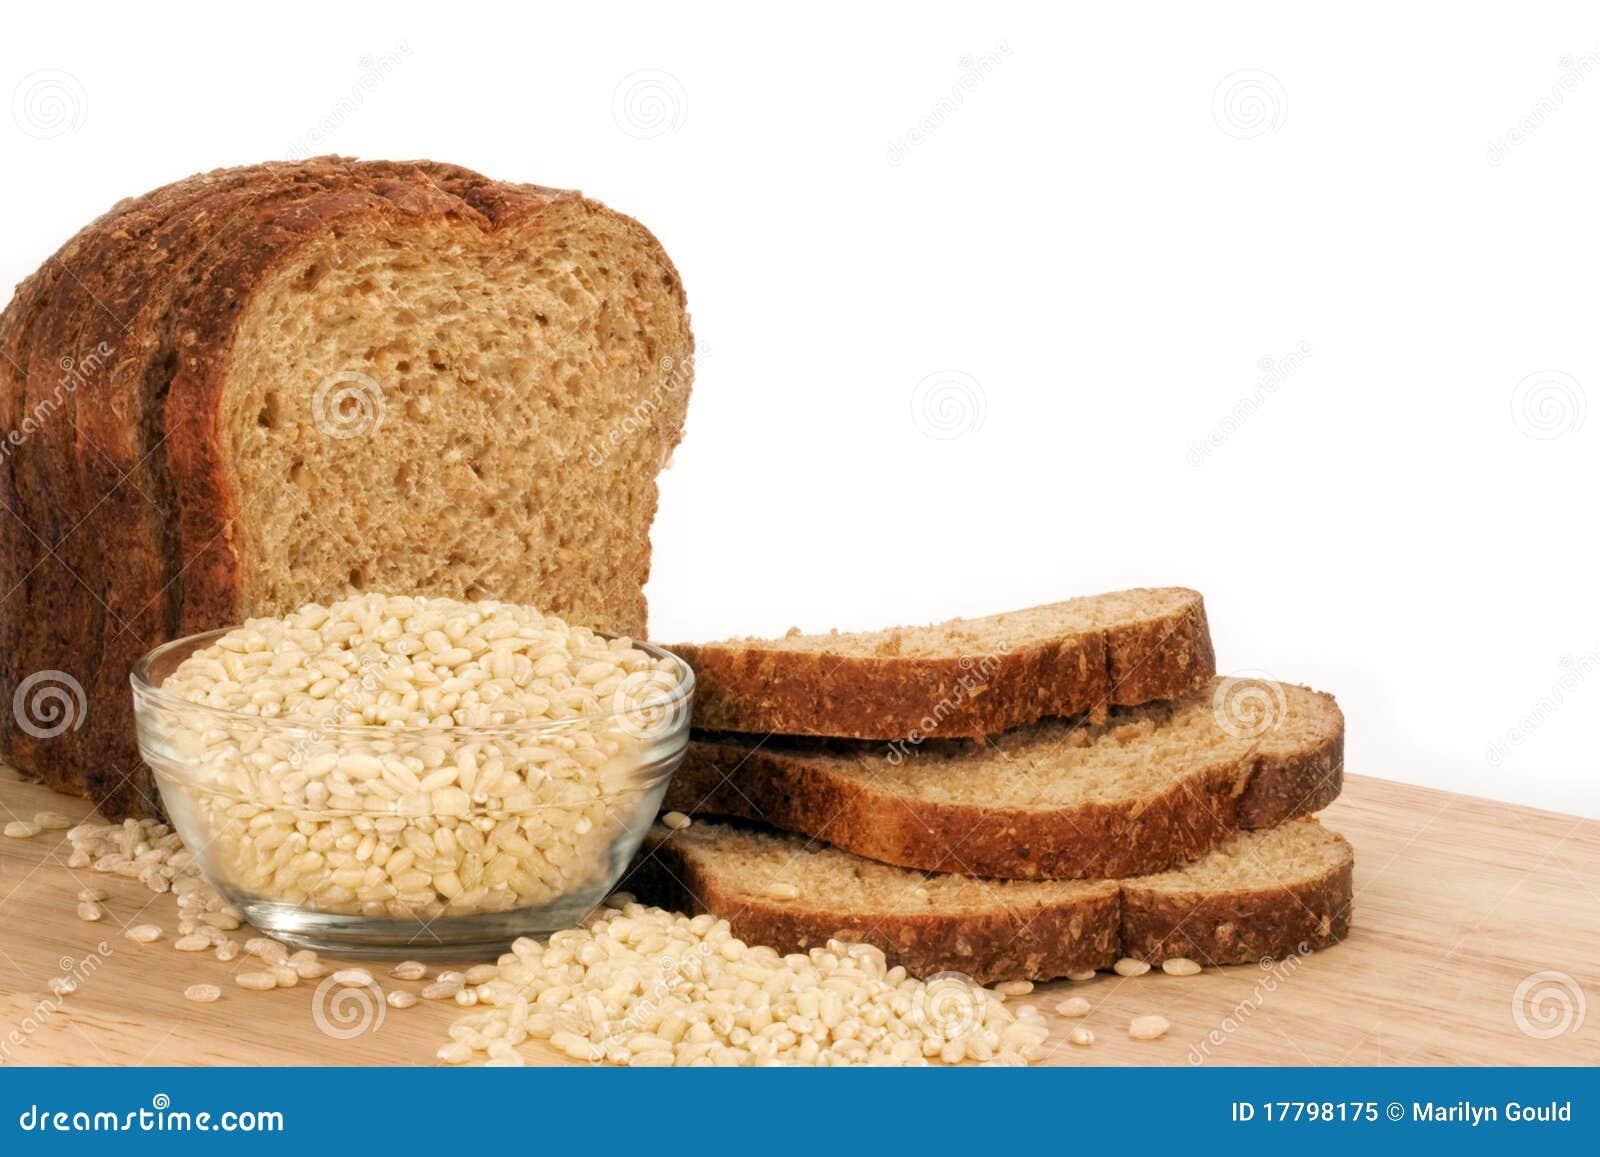 Bread and Barley